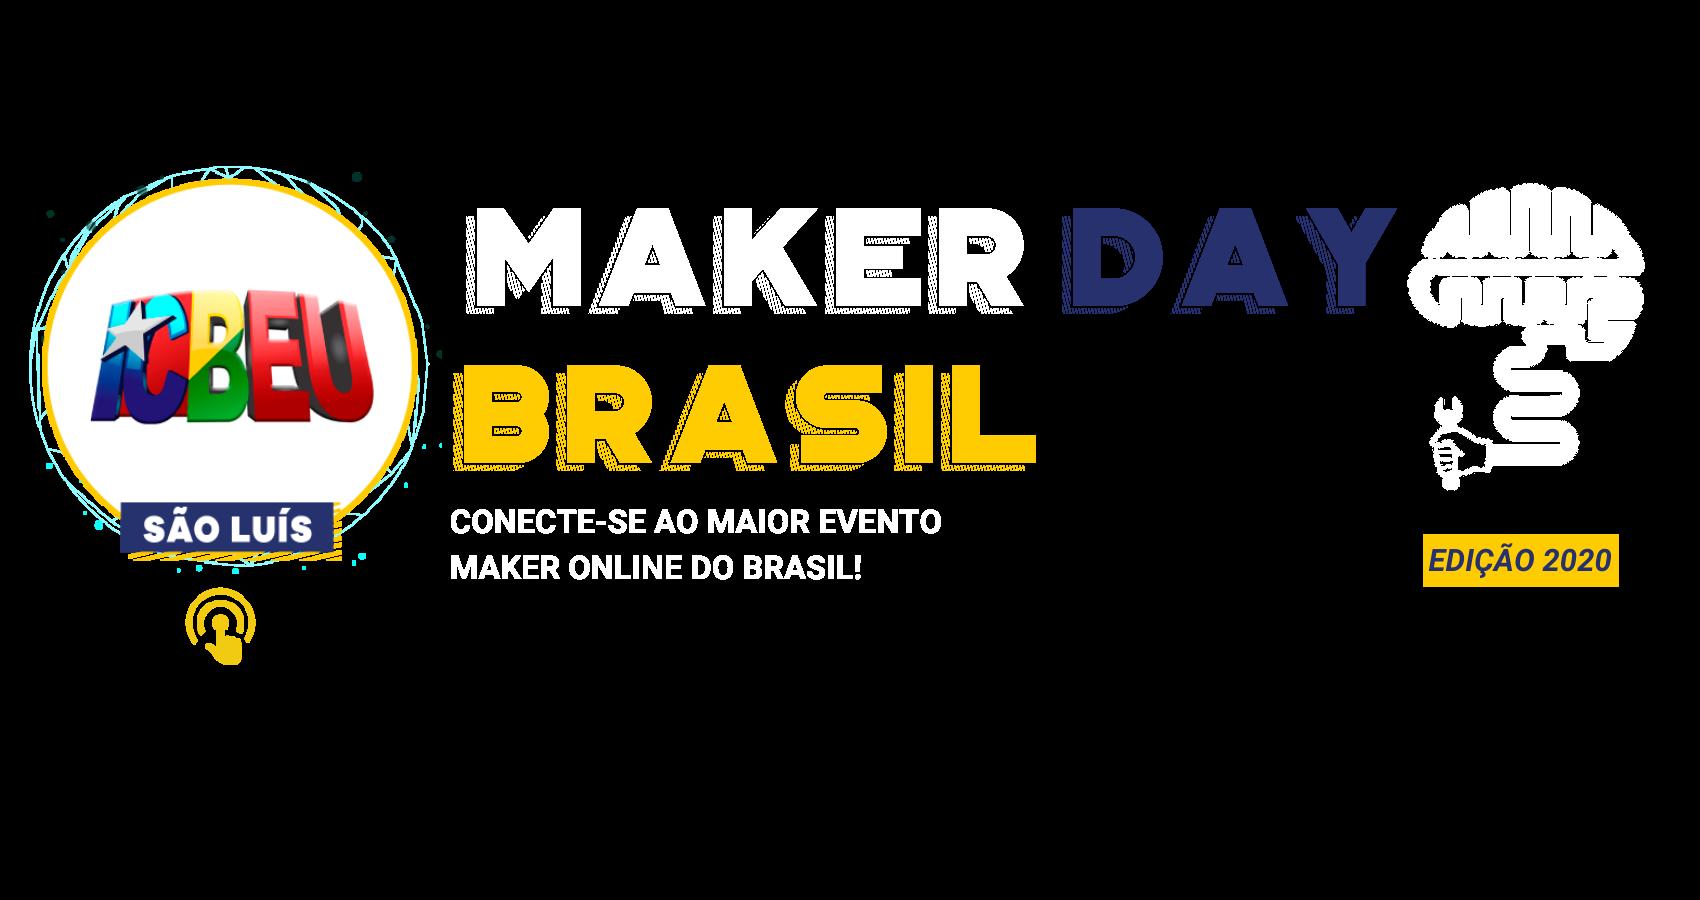 Maker Day Brasil Capa São Luíz